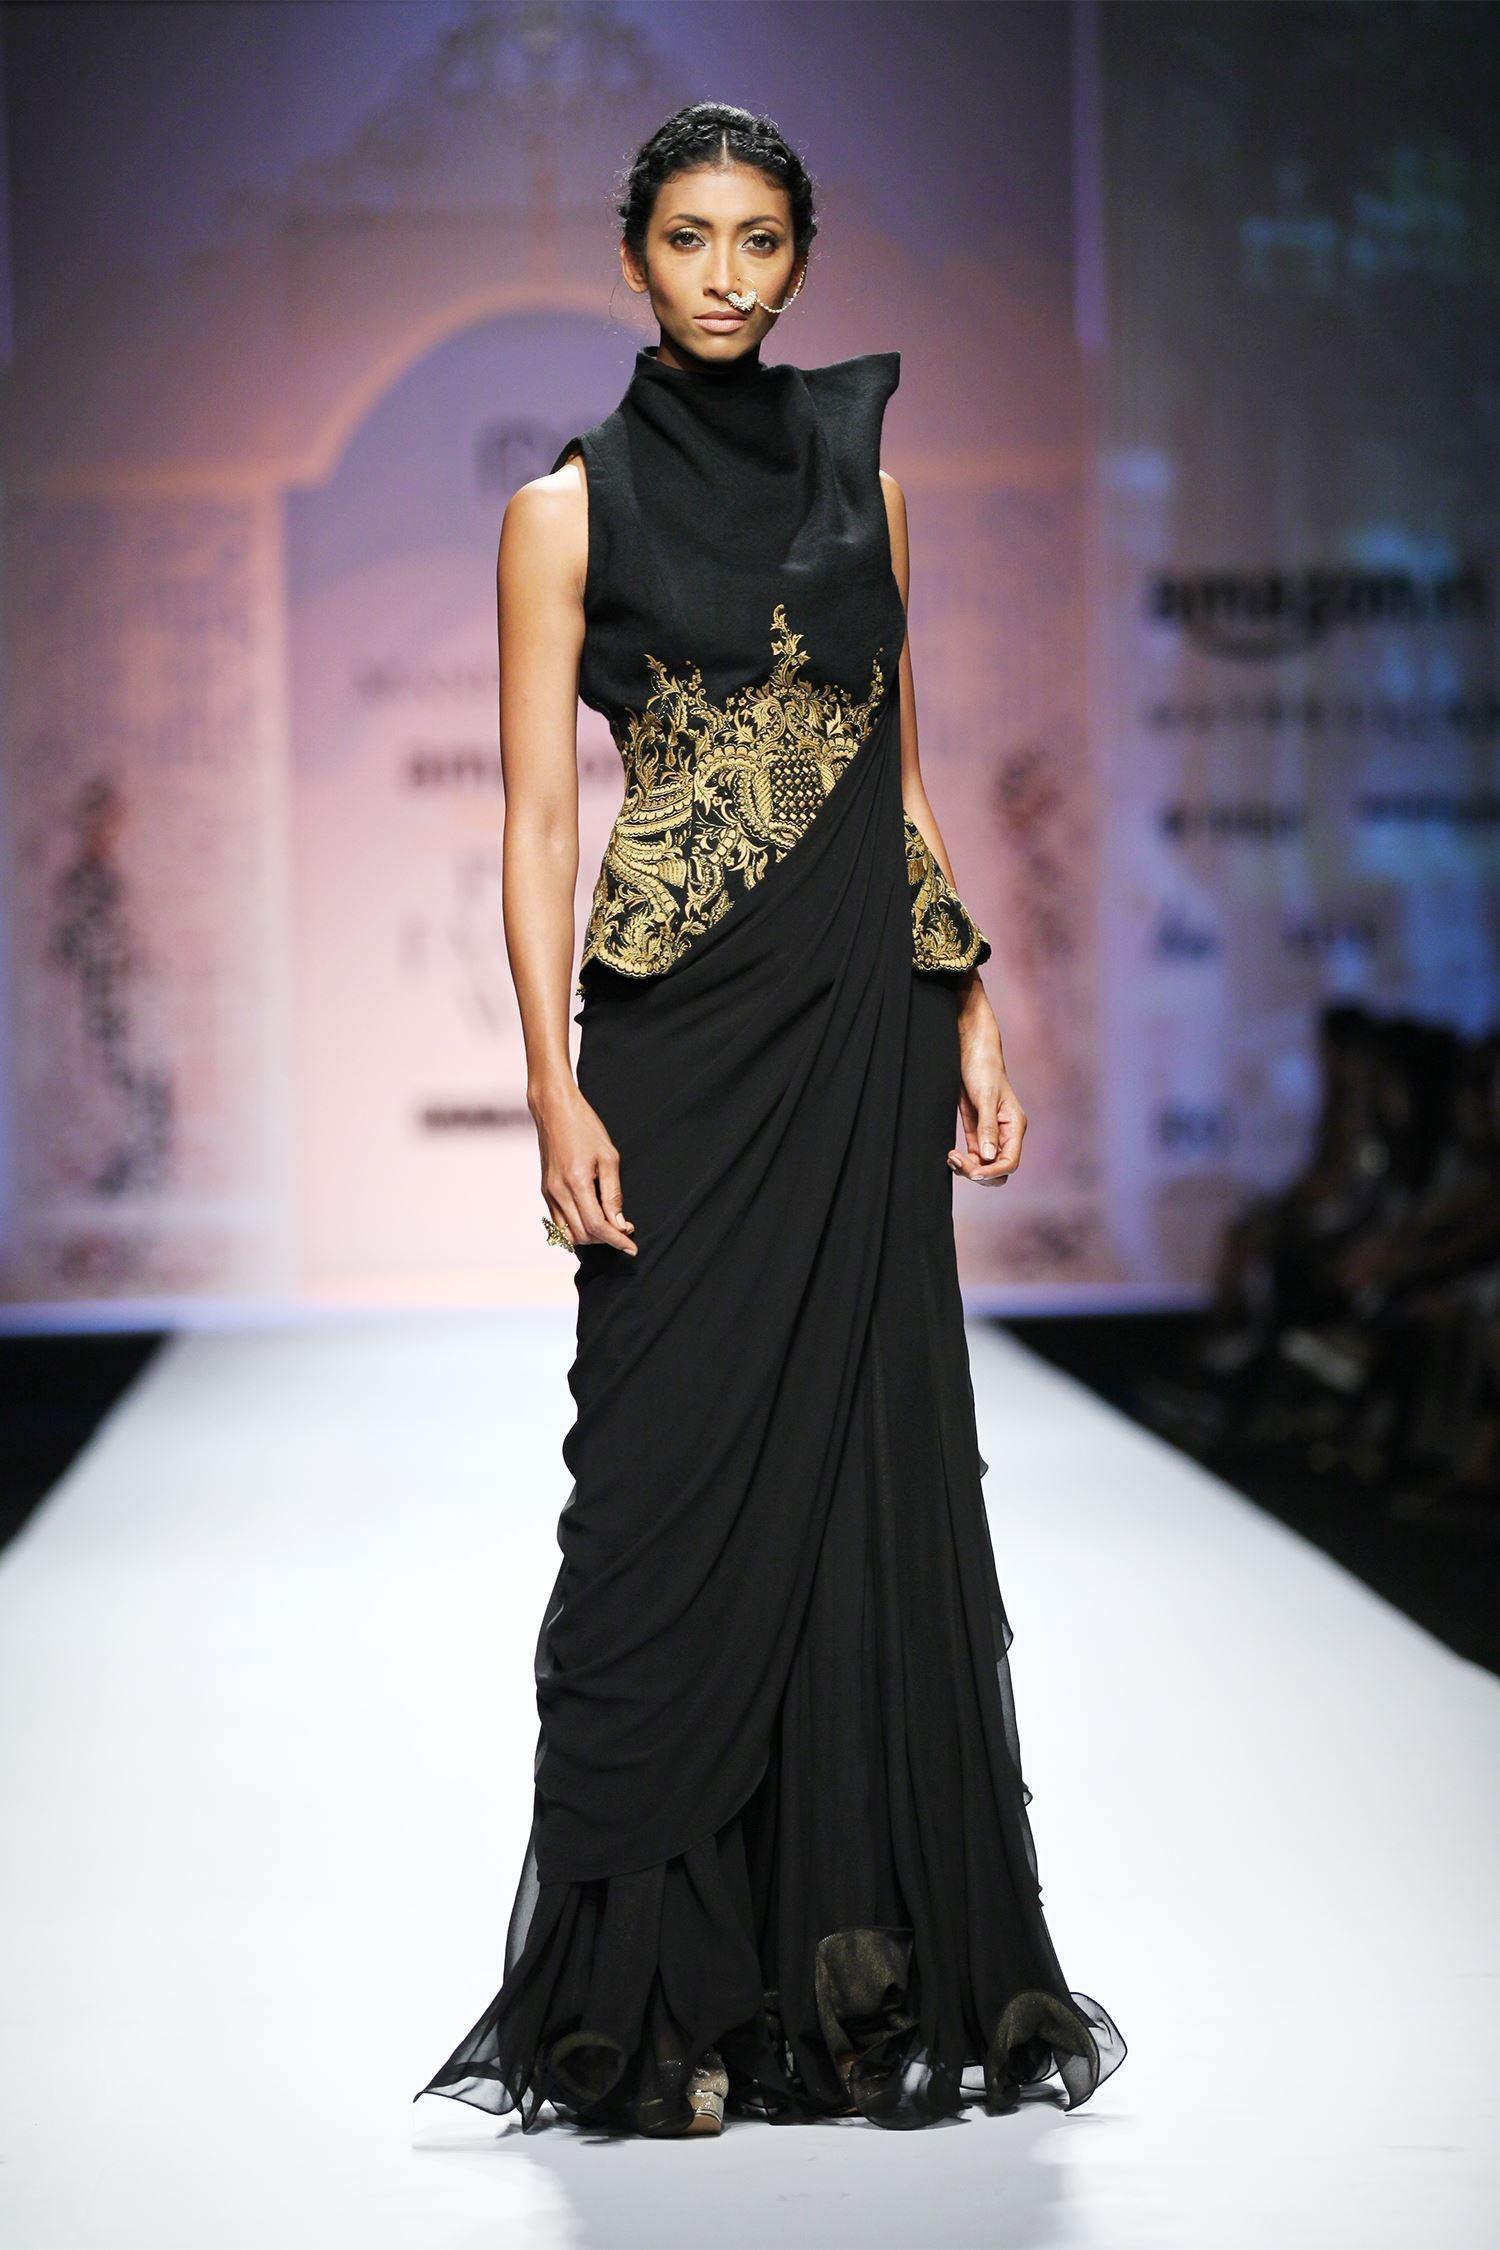 Buy Black ruffled sari gown by Mandira Wirk at Aza Fashions